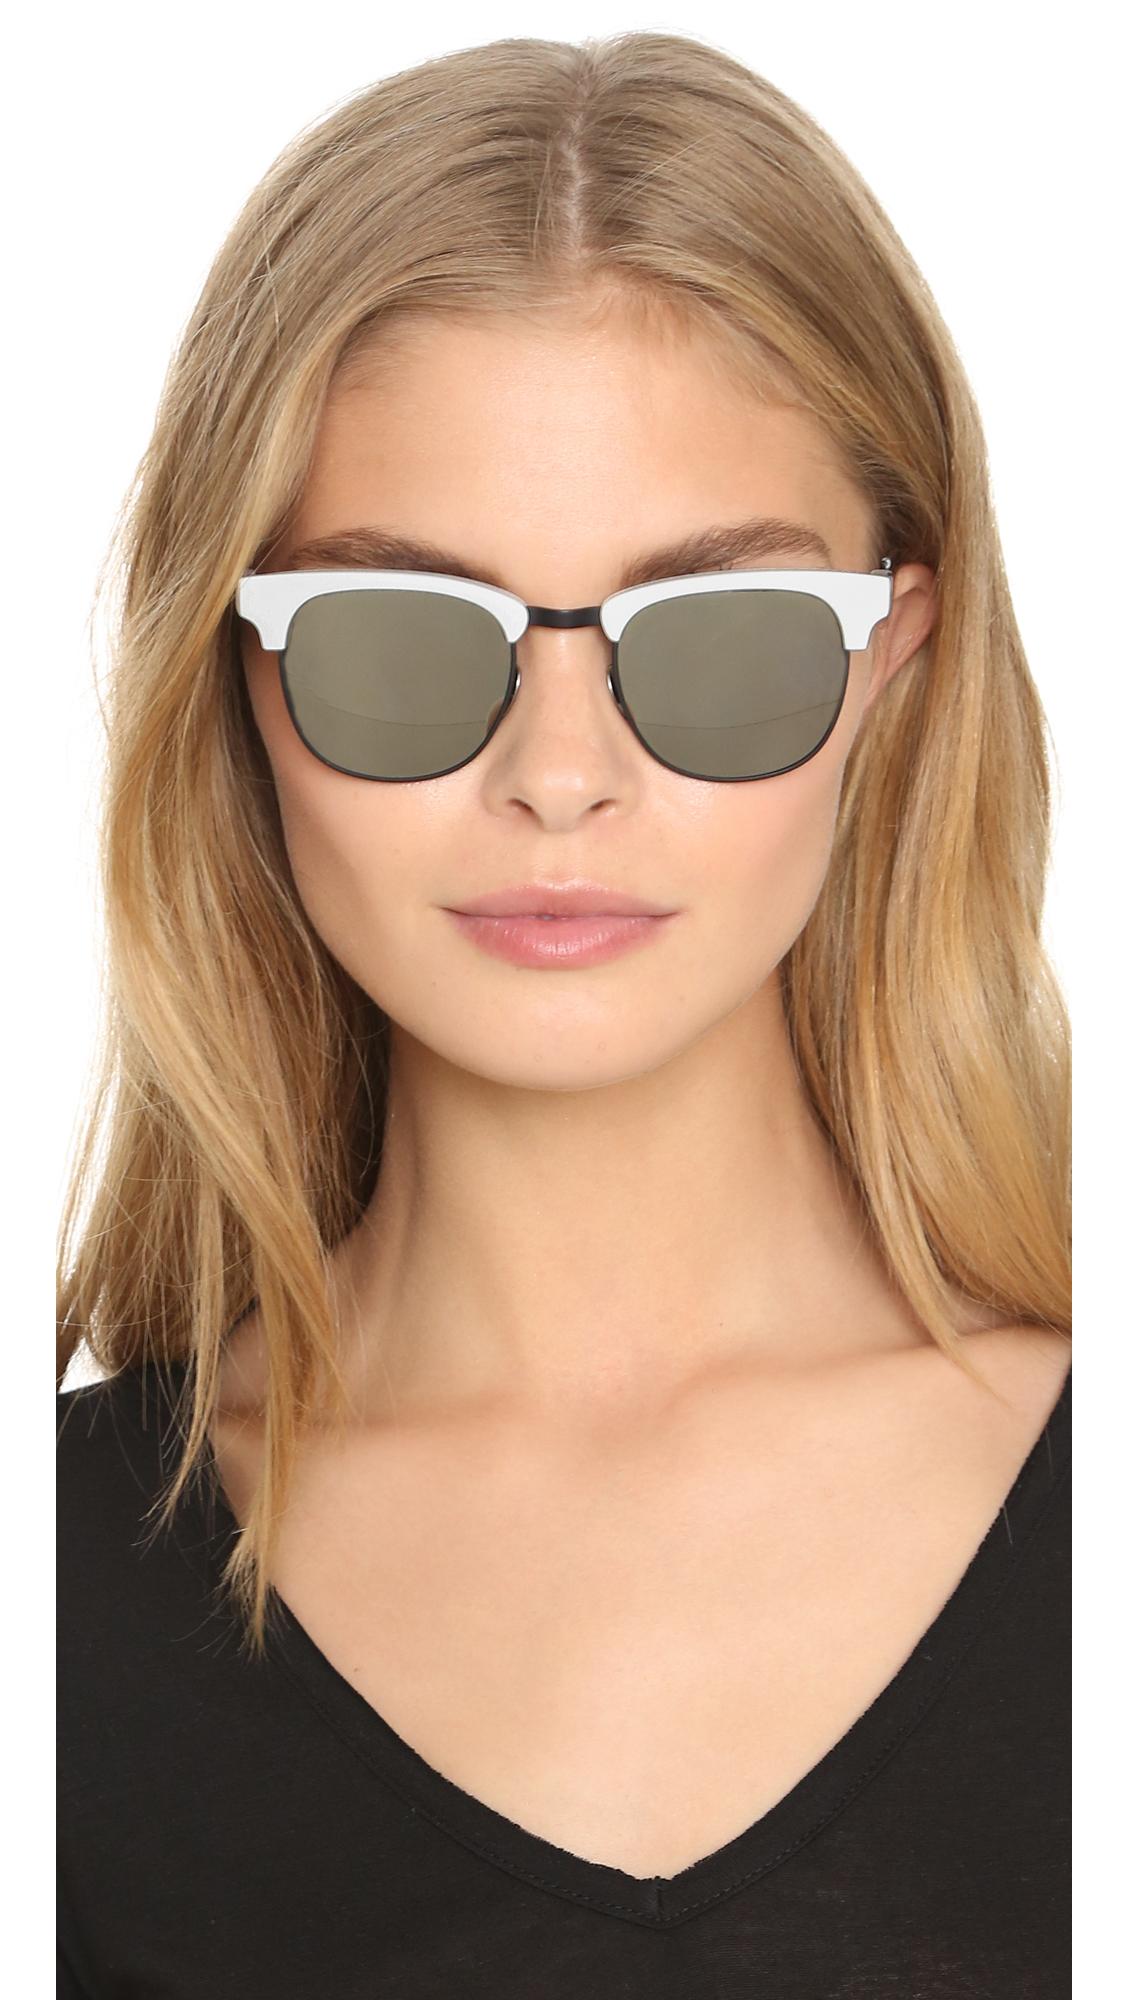 Buy Sale Online Westward Leaning Vanguard 11 sunglasses Buy Cheap Footlocker Finishline Many Kinds Of Cheap Online 89b9F